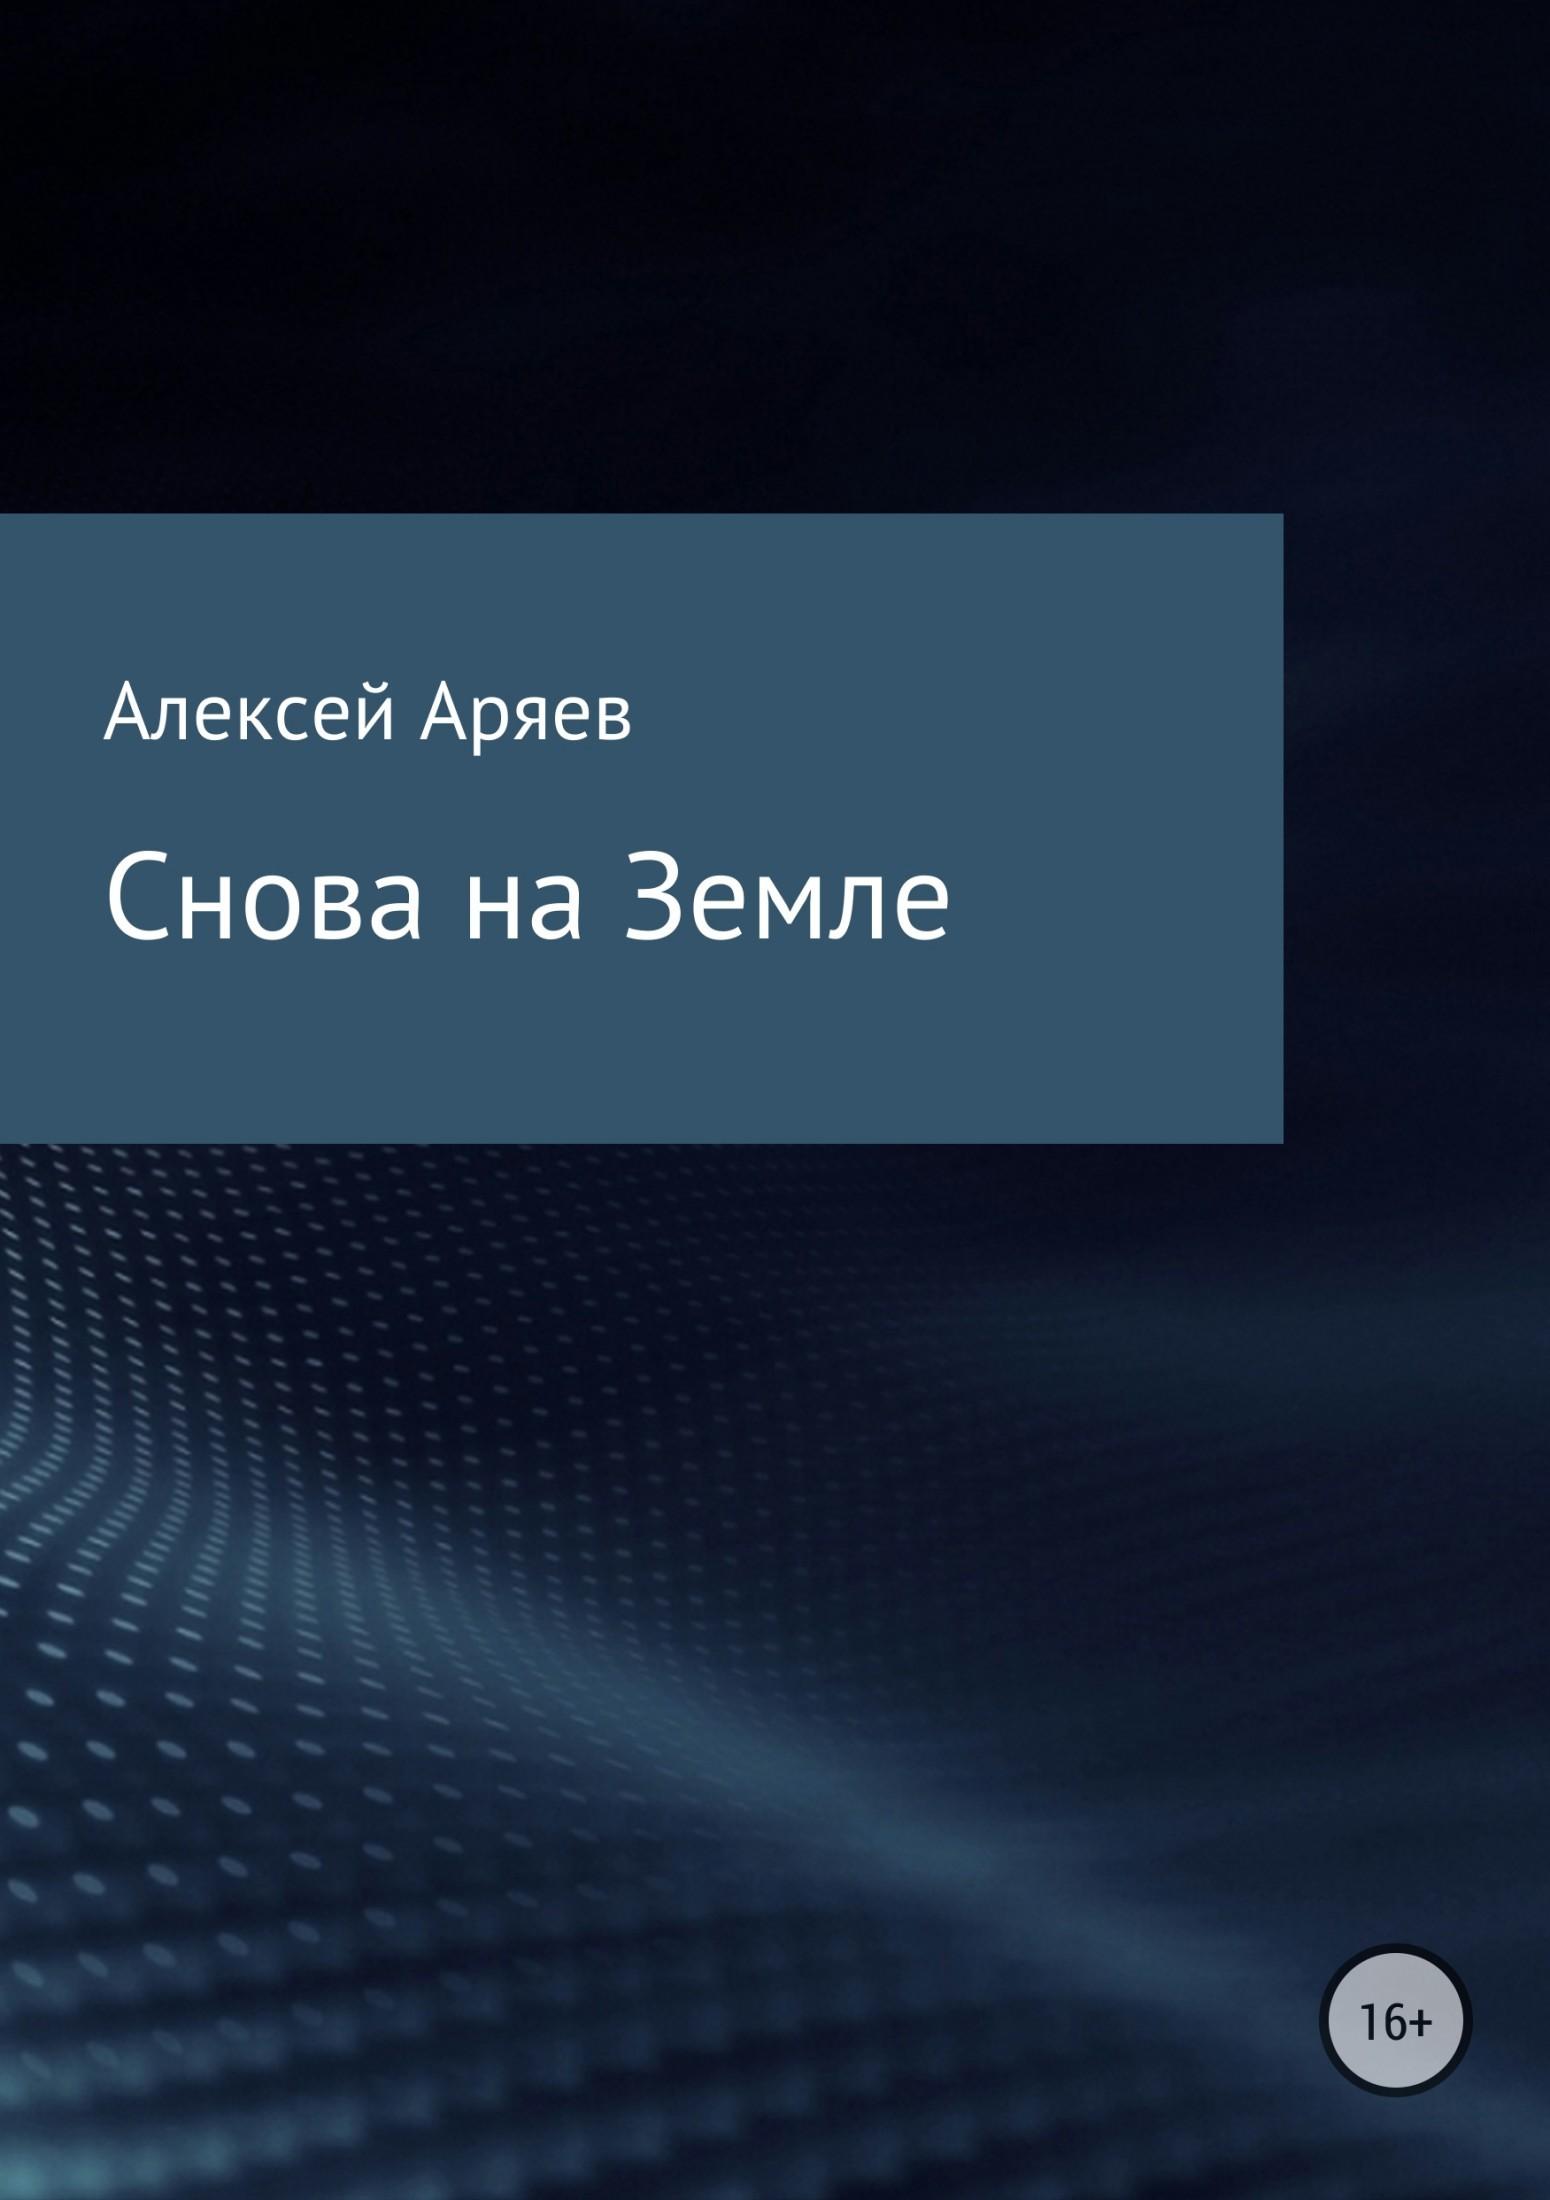 Алексей Аряев - Снова на Земле